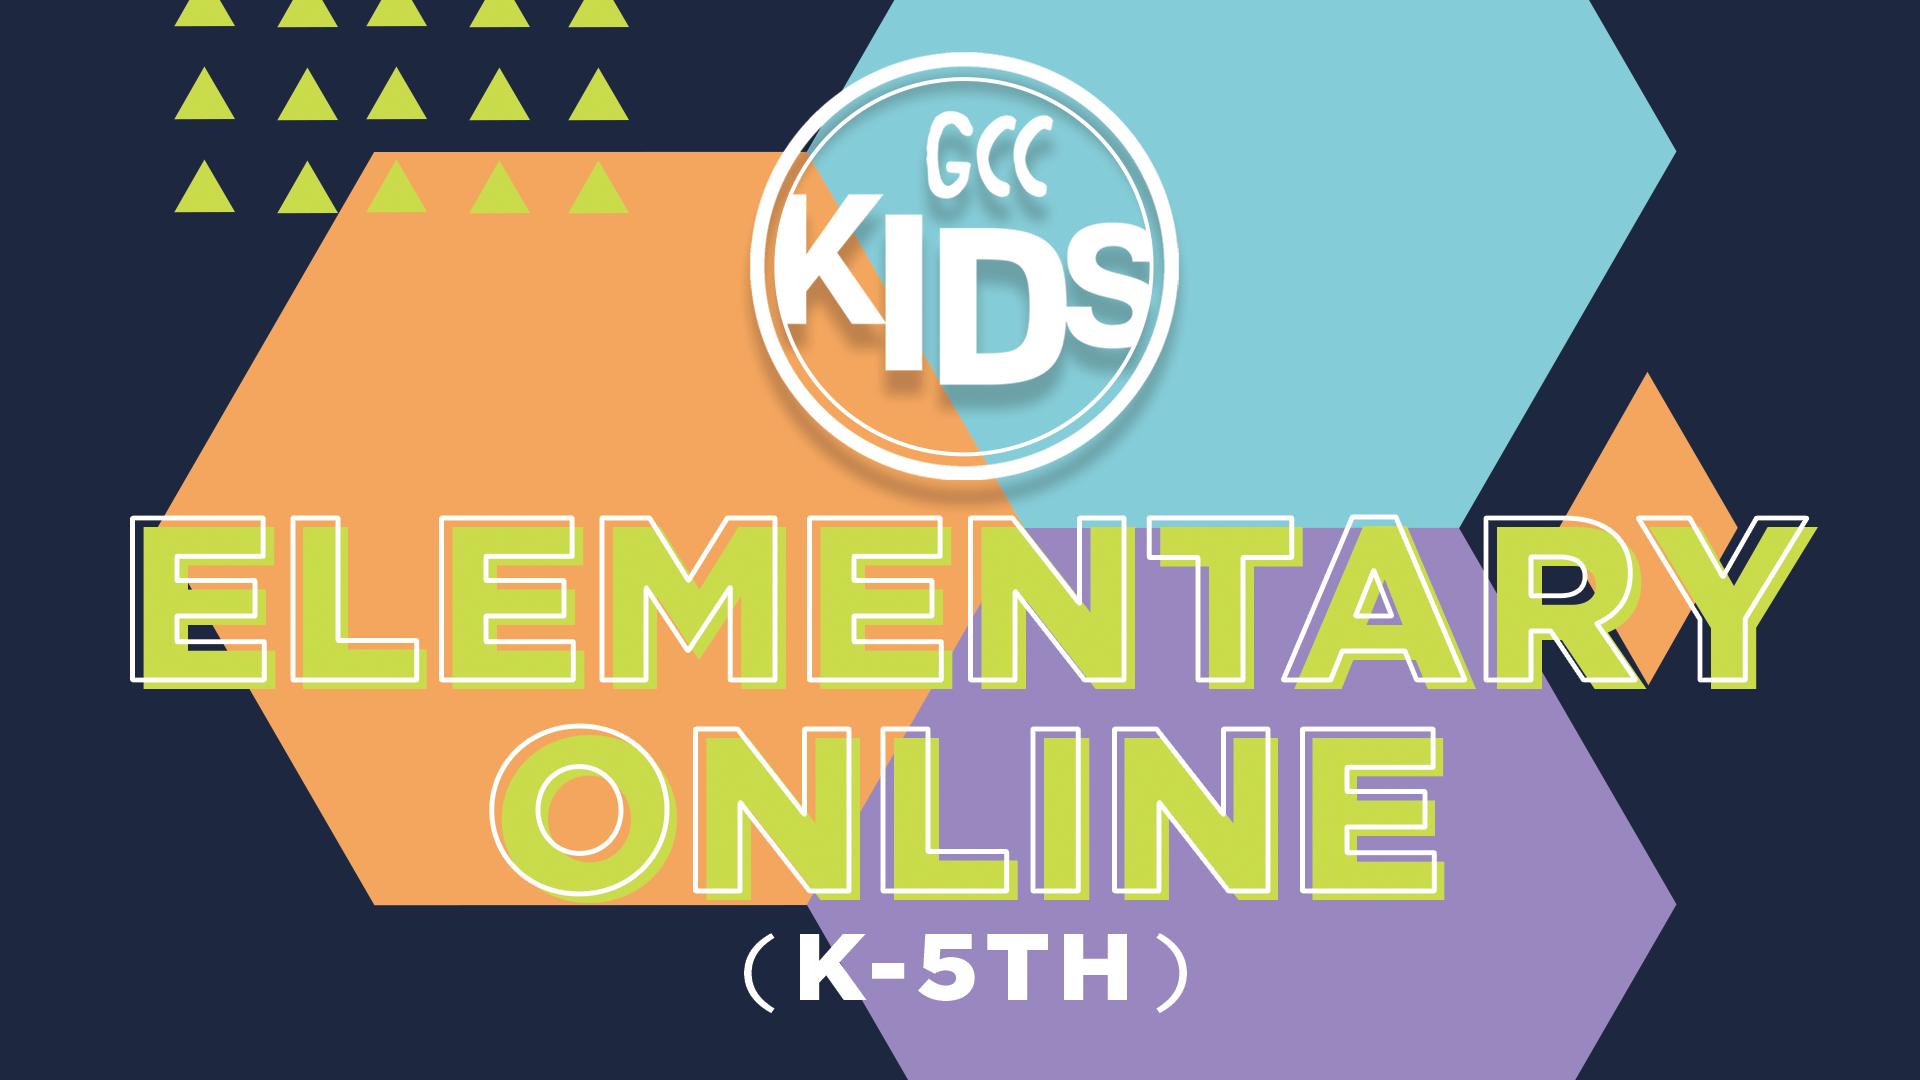 Elementary Online